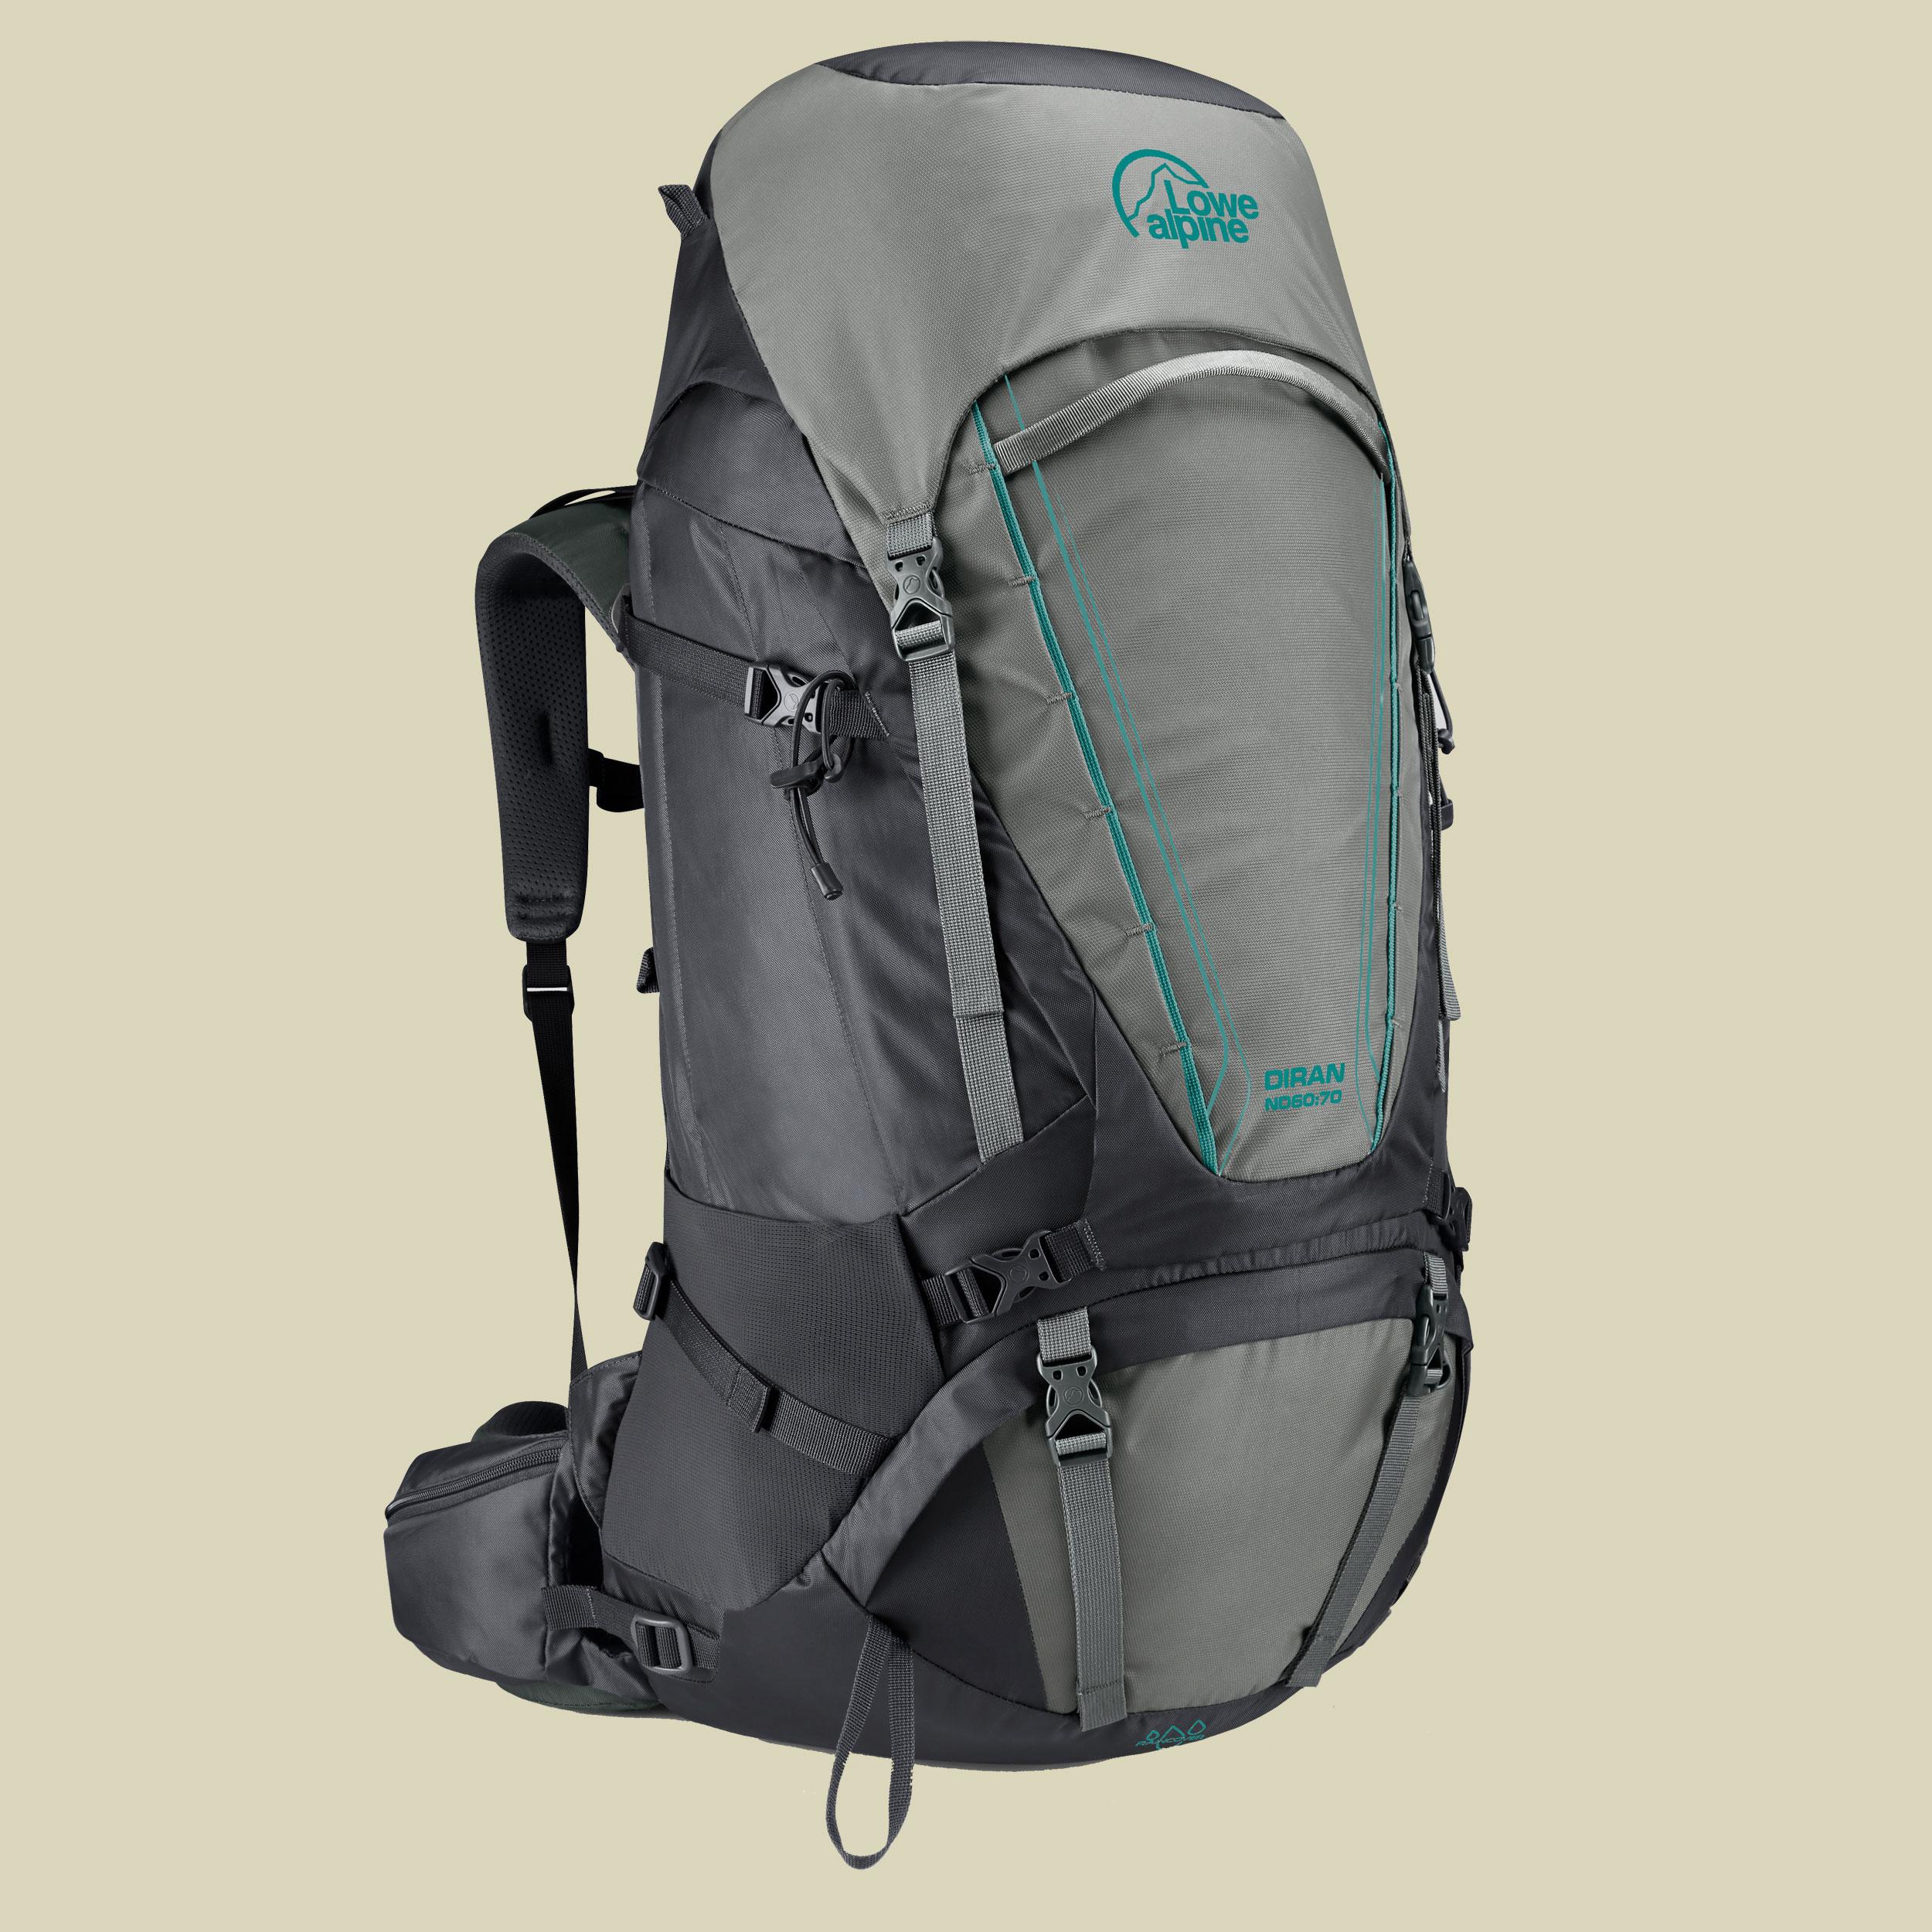 Lowe Alpine Diran ND 50:60 Women Damen Trekkingrucksack Volumen 50 L + 10 l greystone/iron grey